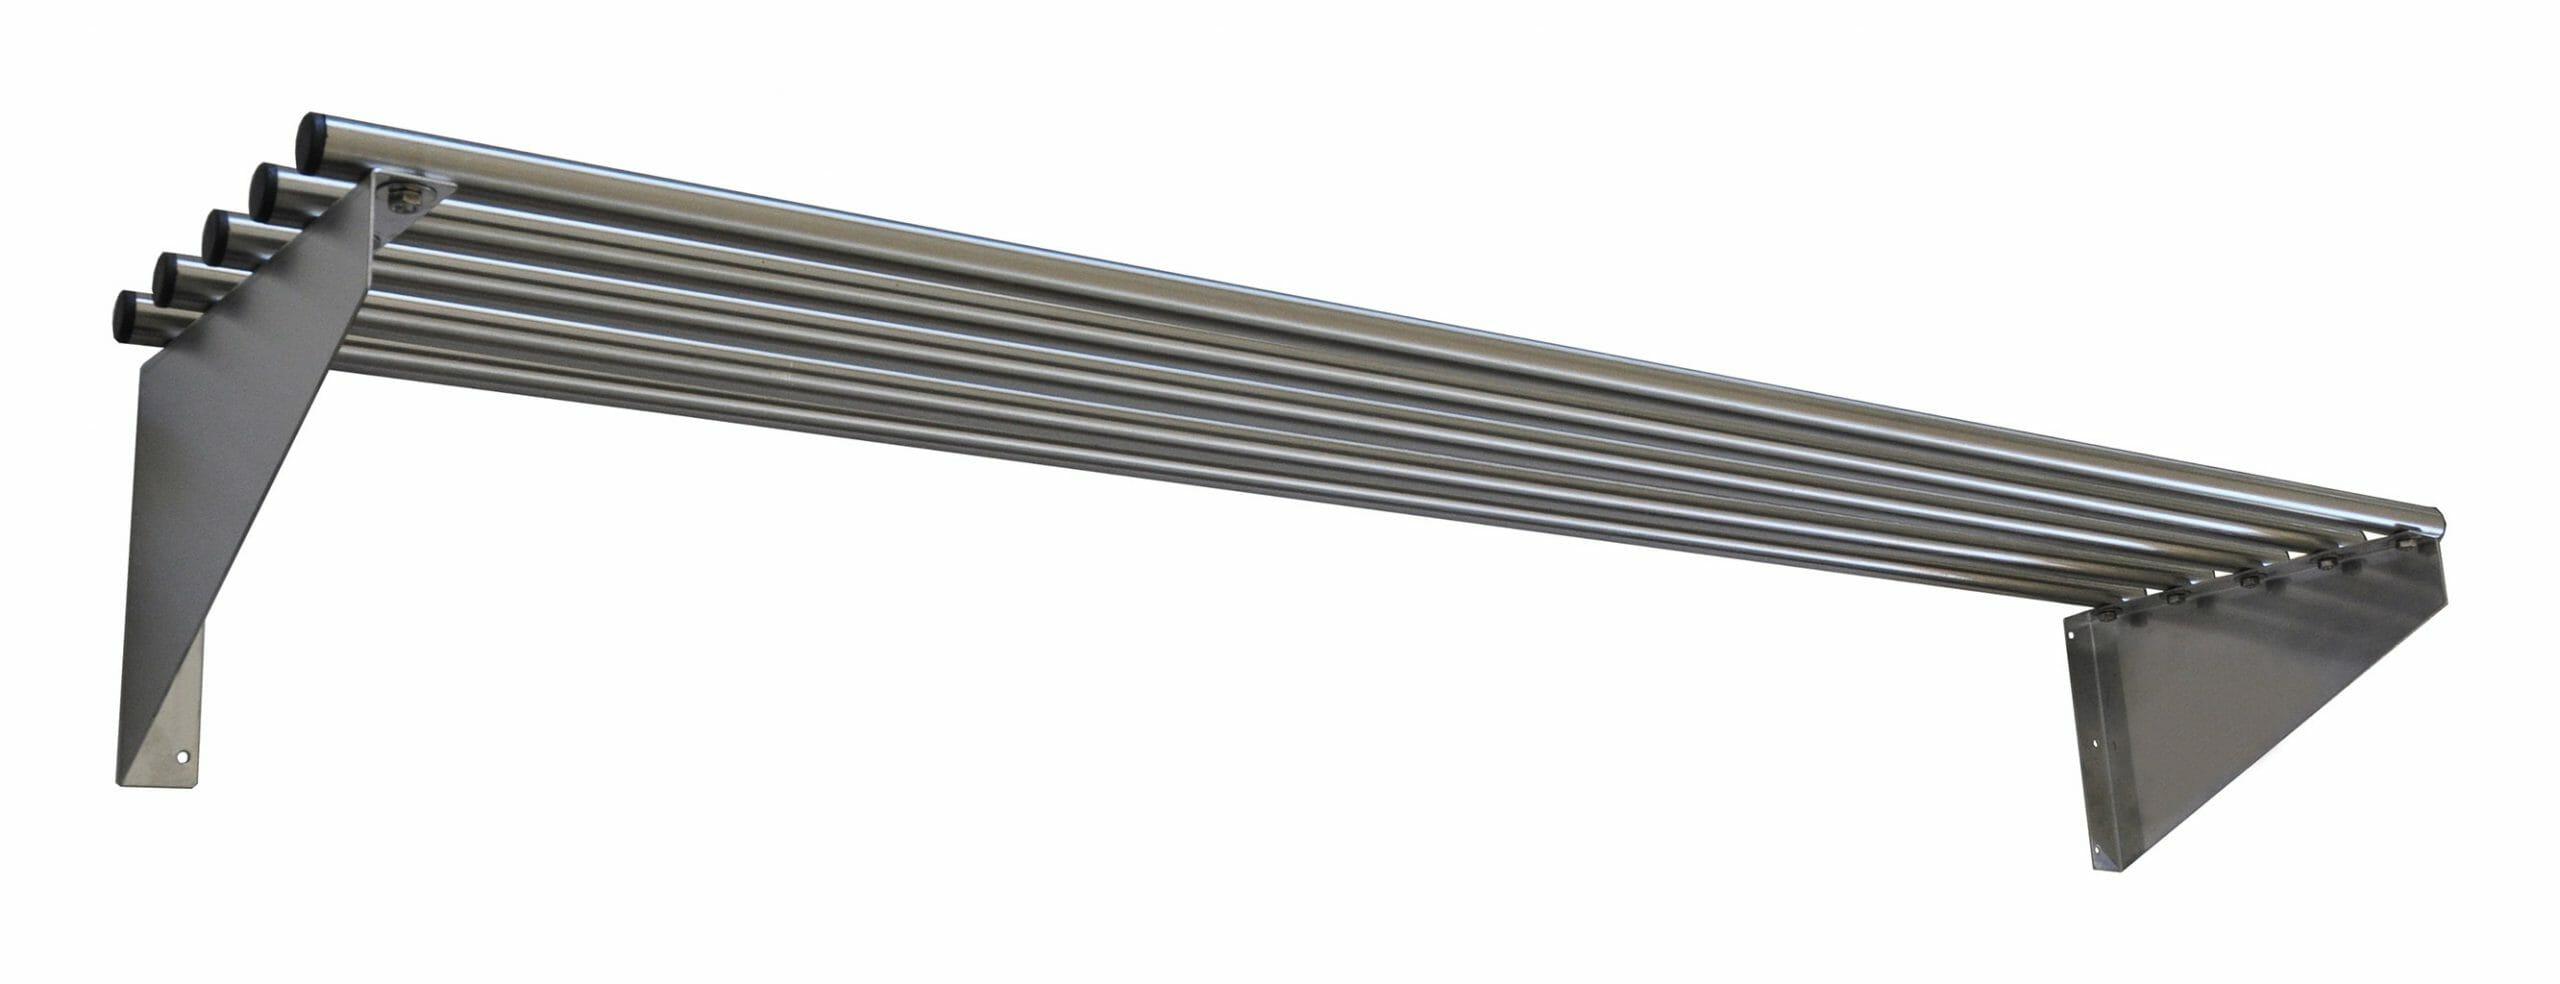 Stainless Steel Pipe Wall Shelf, 1500 X 300mm deep